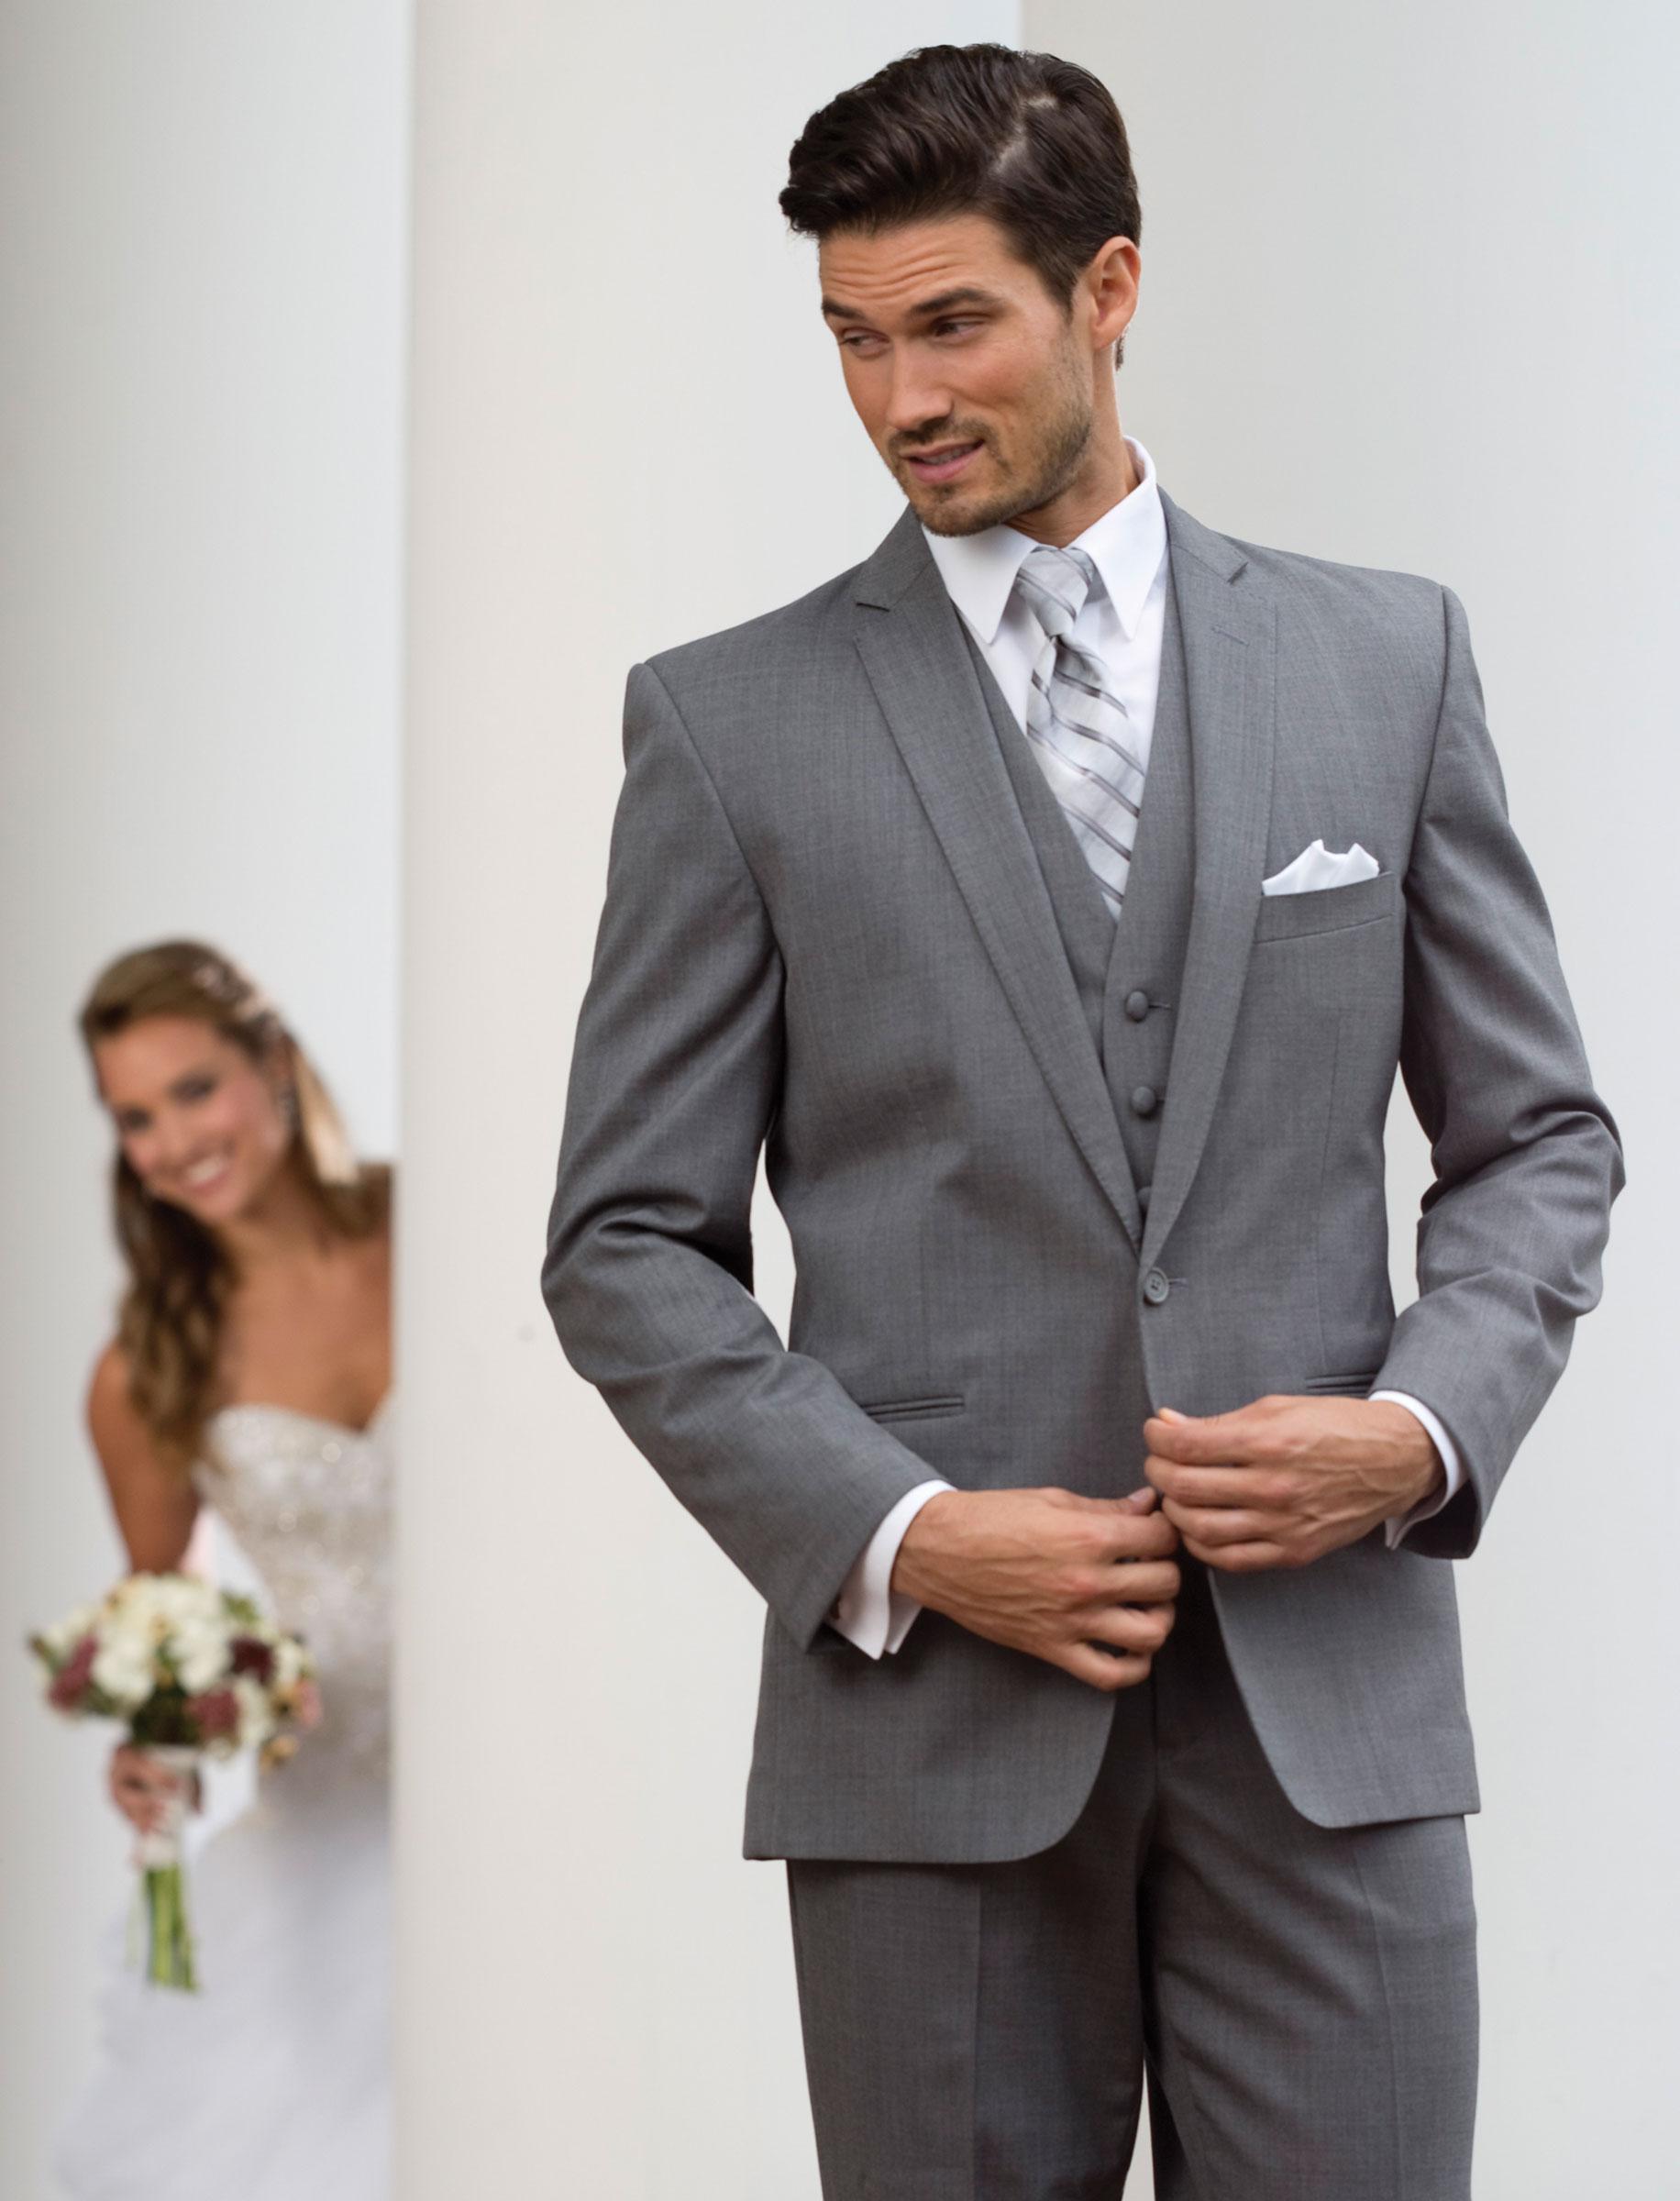 Emejing Grey Tuxedos For Weddings Gallery - Styles & Ideas 2018 ...